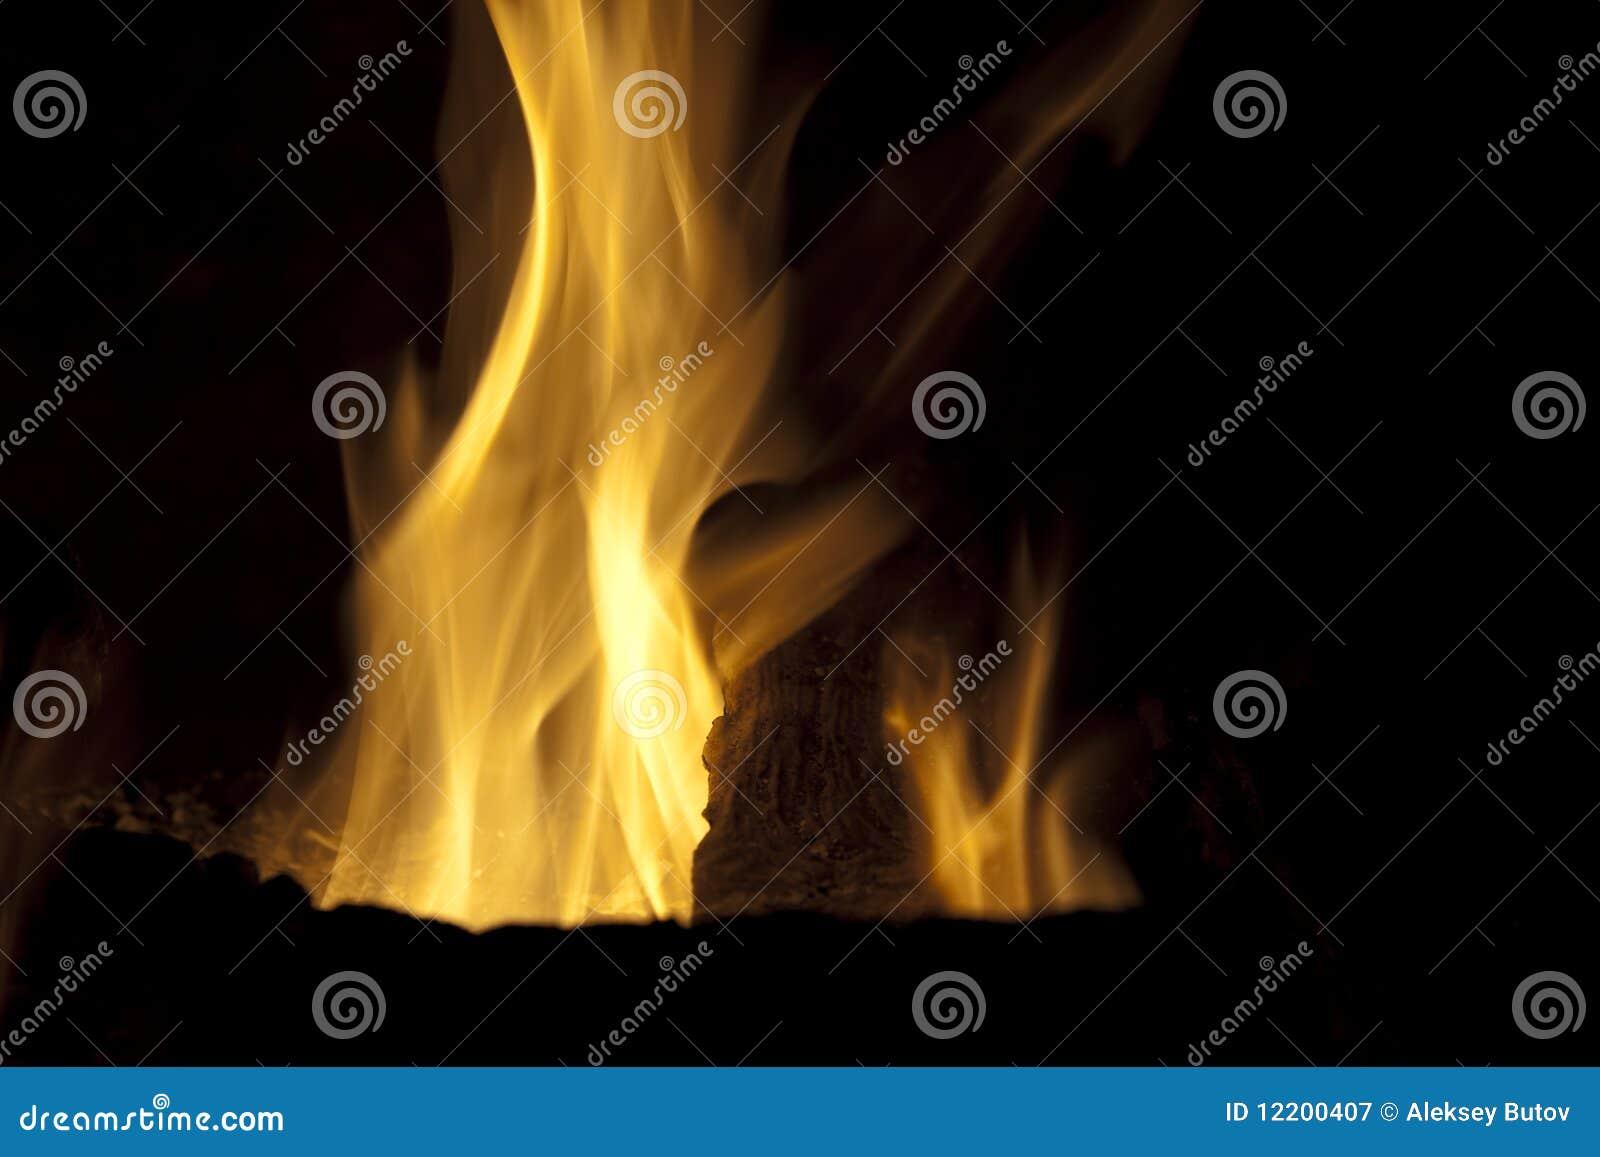 Flame02